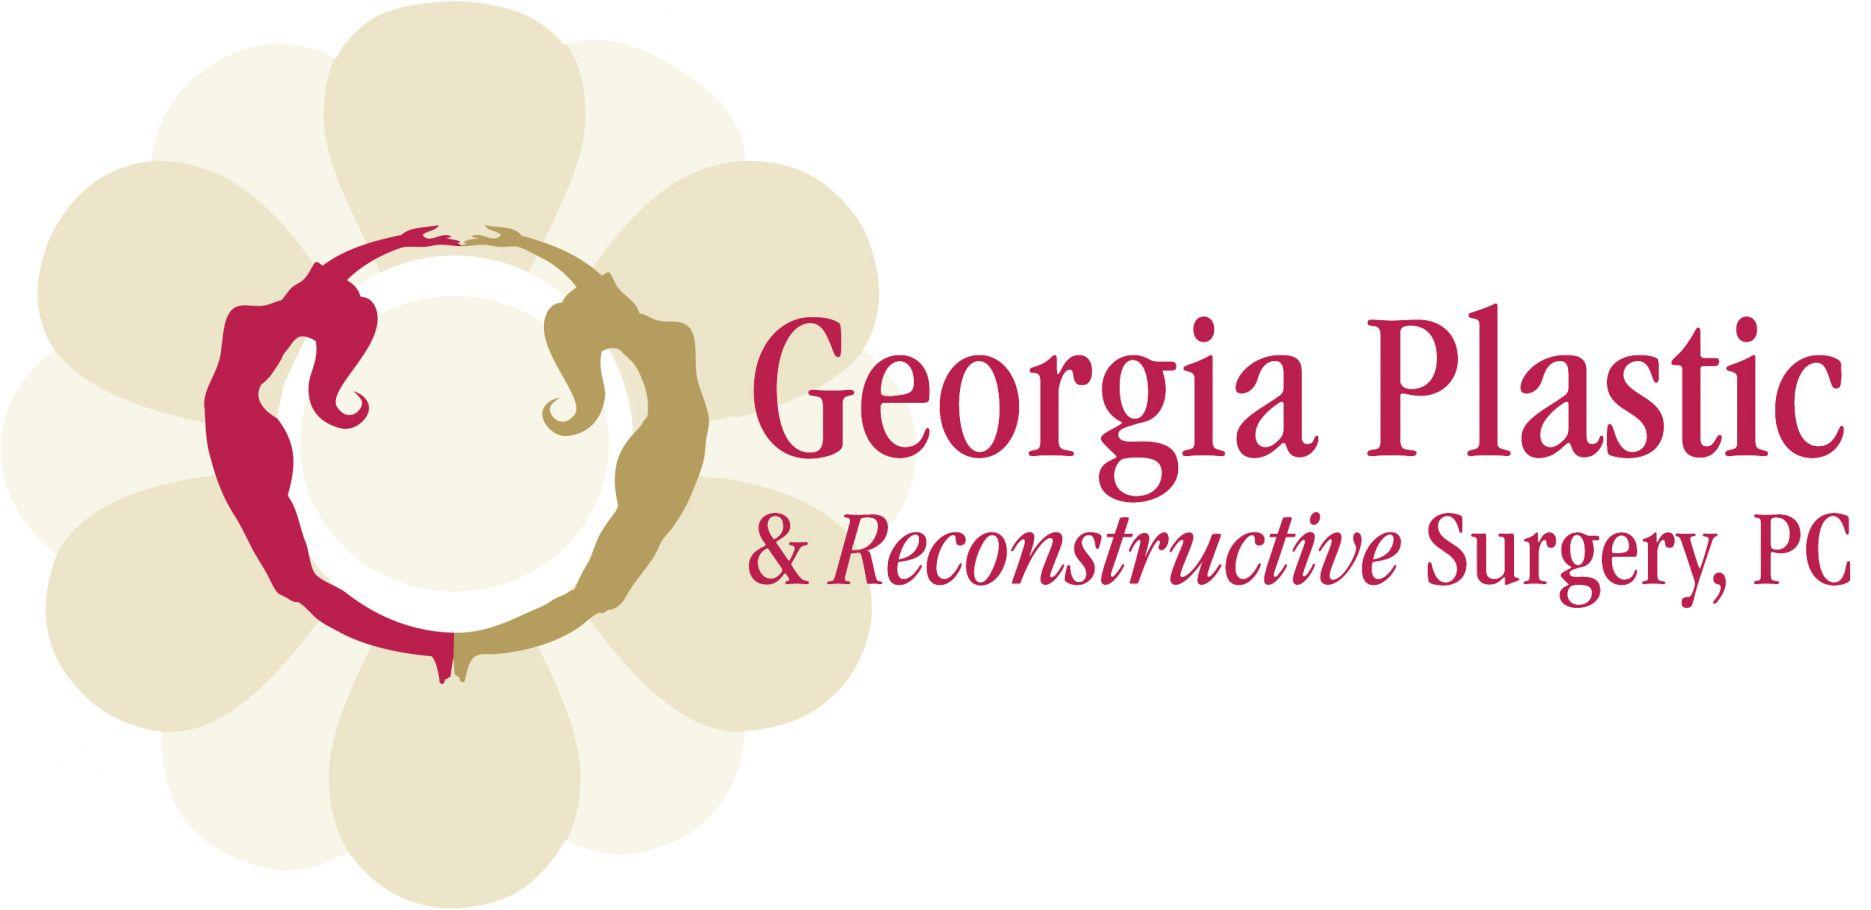 Georgia Plastic & Reconstructive Surgery Logo